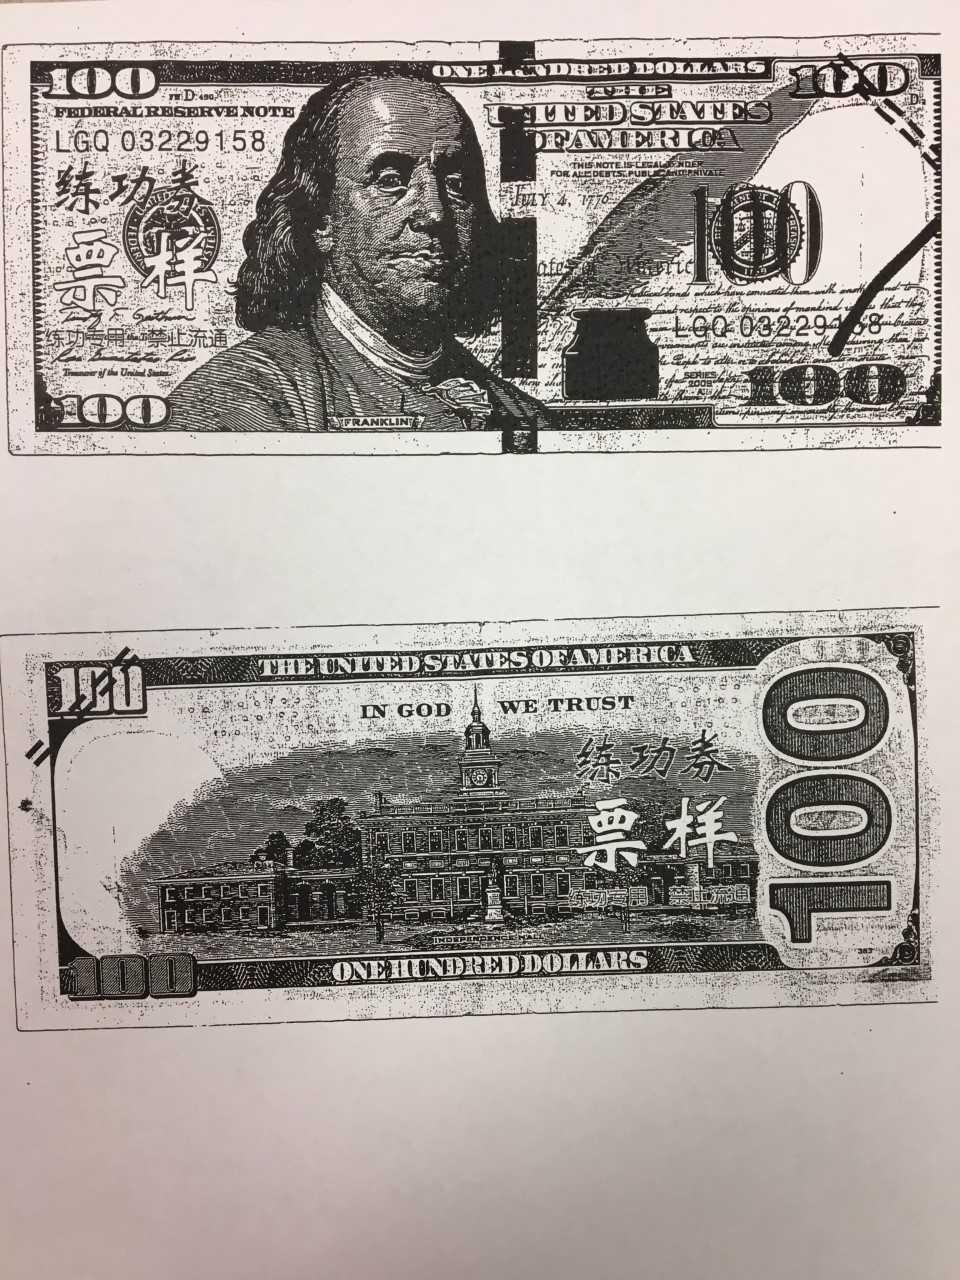 counterfeitbills_1540863048389.jpg